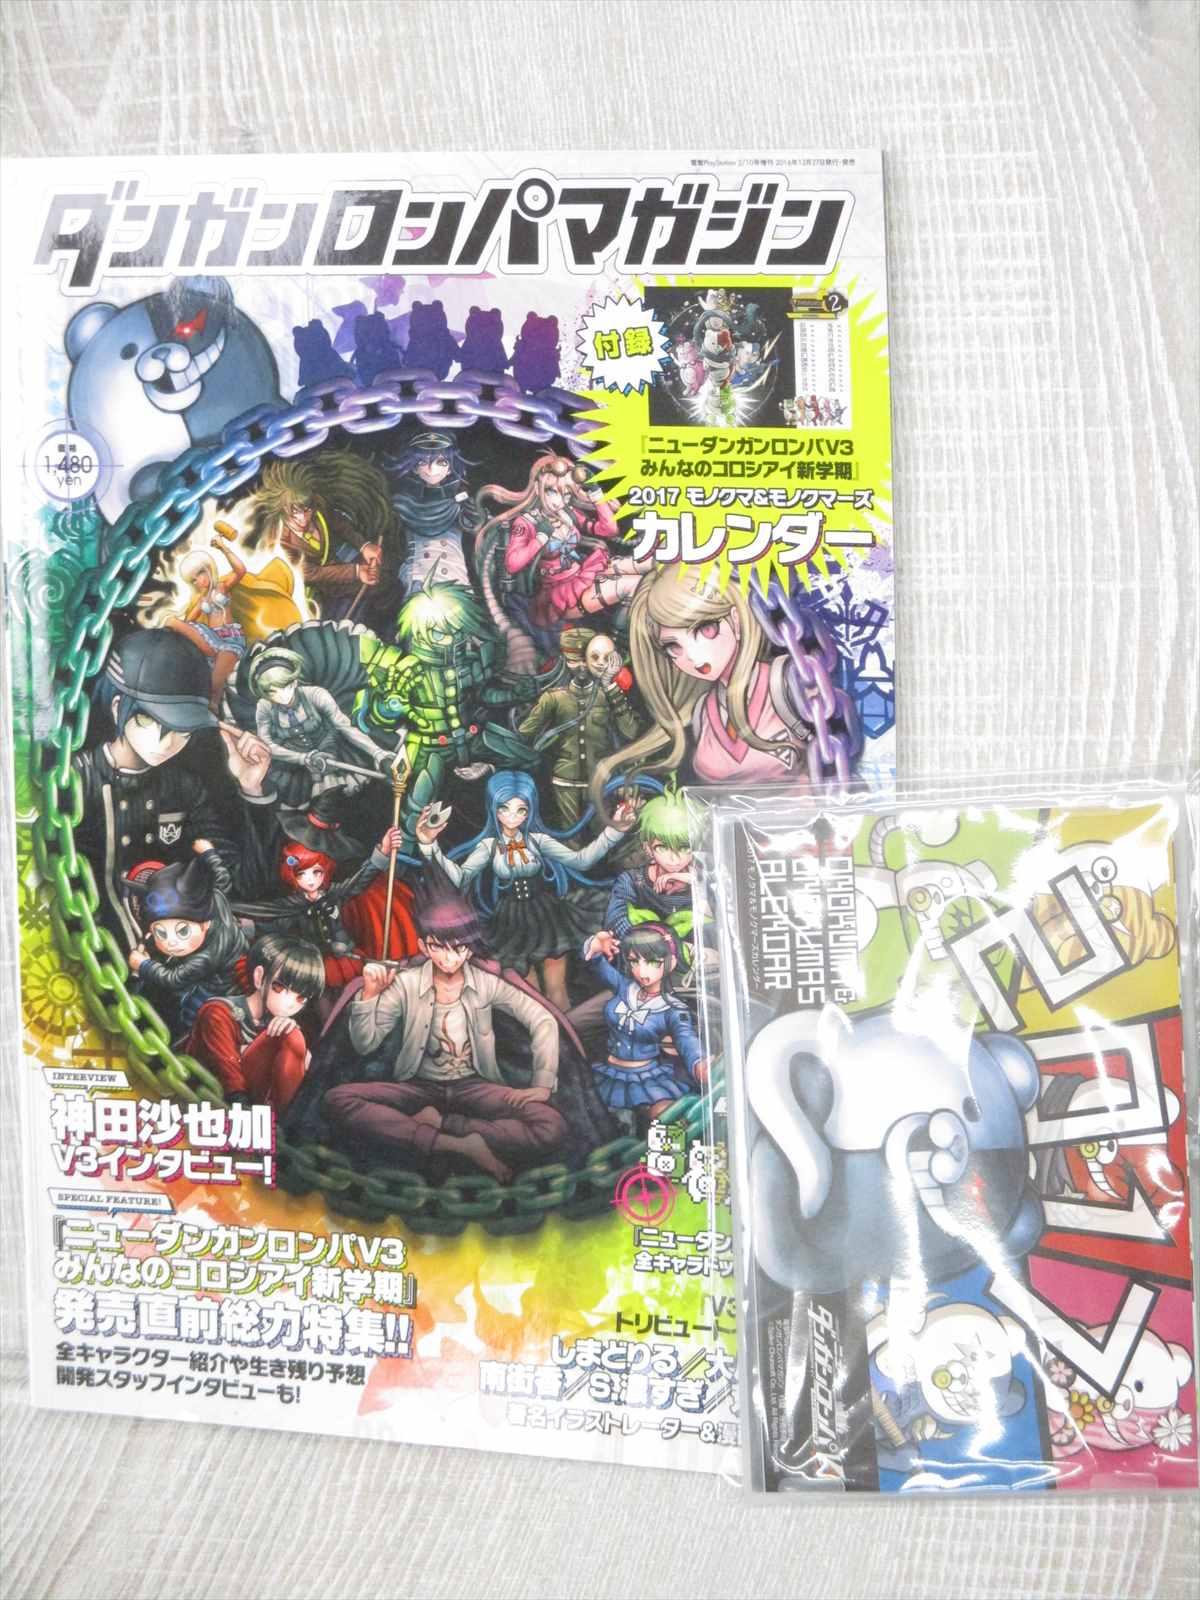 JAPAN Magazine Danganronpa Magazine